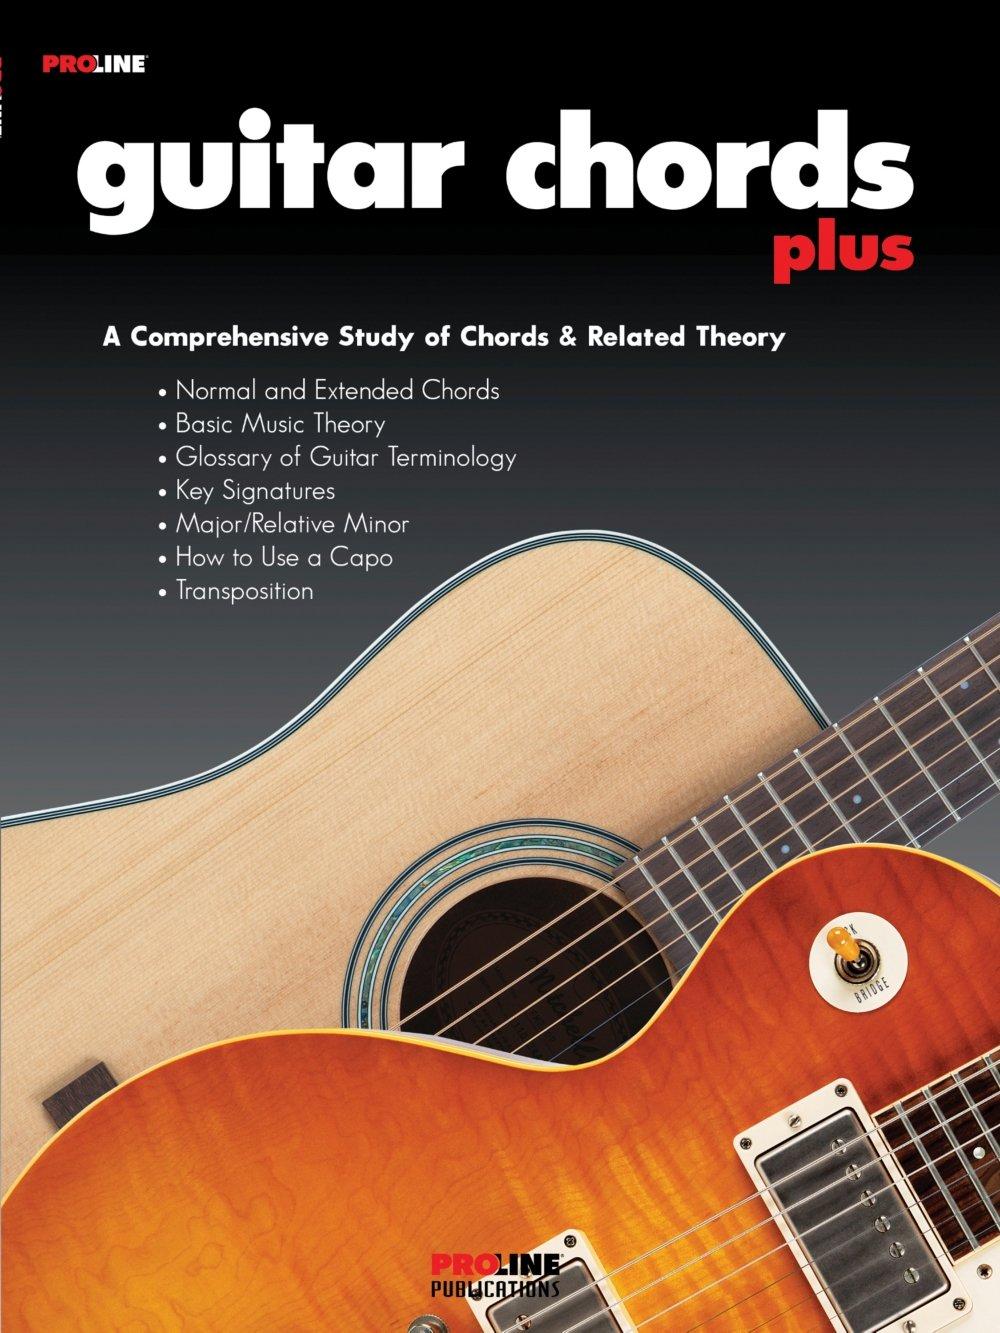 Proline Guitar Chords Plus Book Proline 0073999395846 Amazon